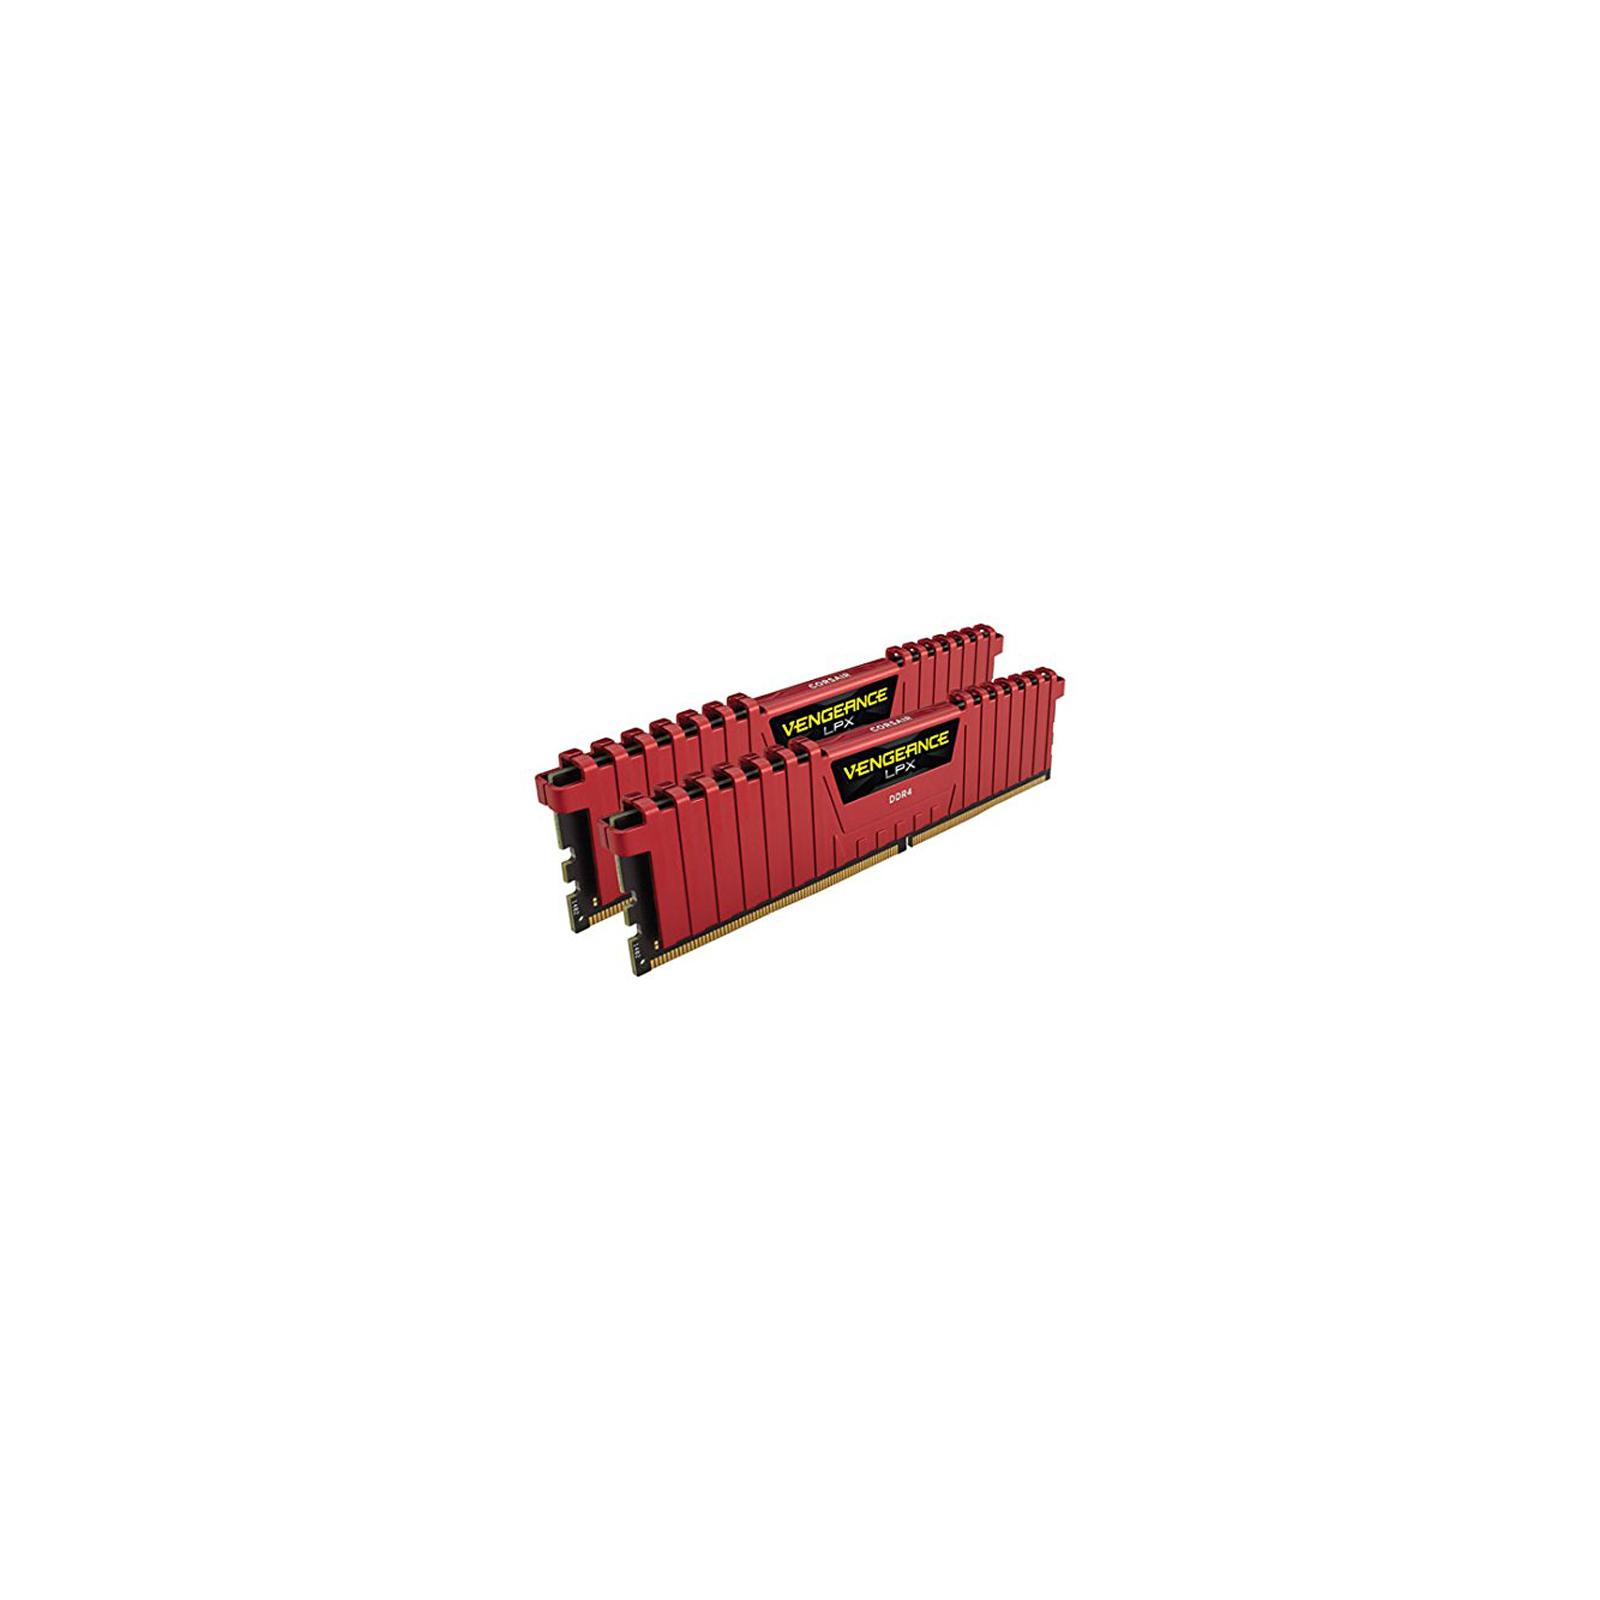 Модуль памяти для компьютера DDR4 16GB (2x8GB) 3000 MHz Vengeance LPX Red CORSAIR (CMK16GX4M2B3000C15R) изображение 3